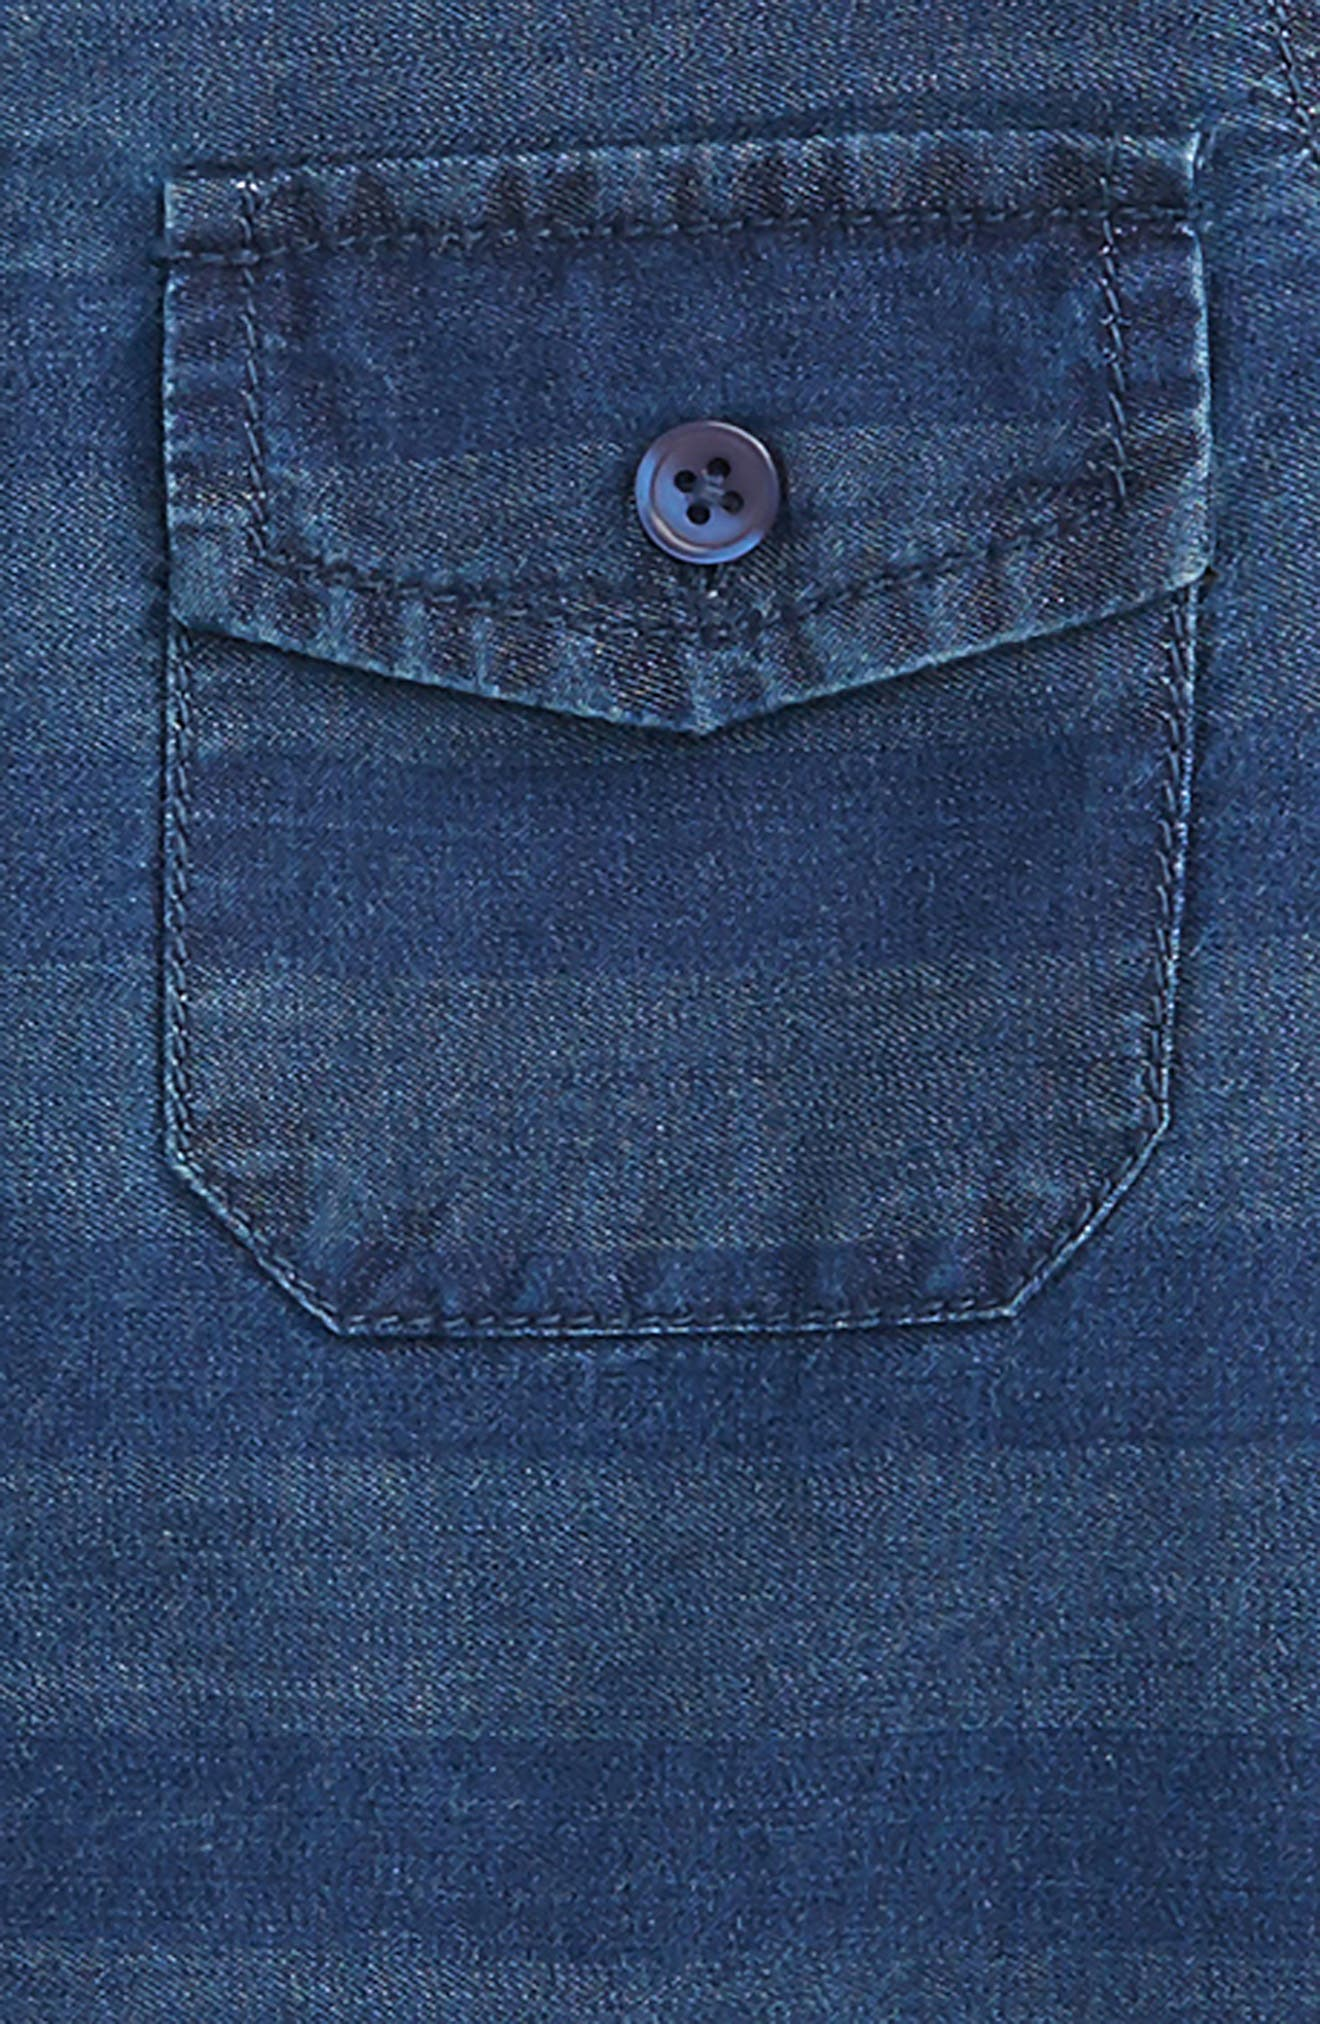 Aiden Stripe Chambray Shirt,                             Alternate thumbnail 3, color,                             402